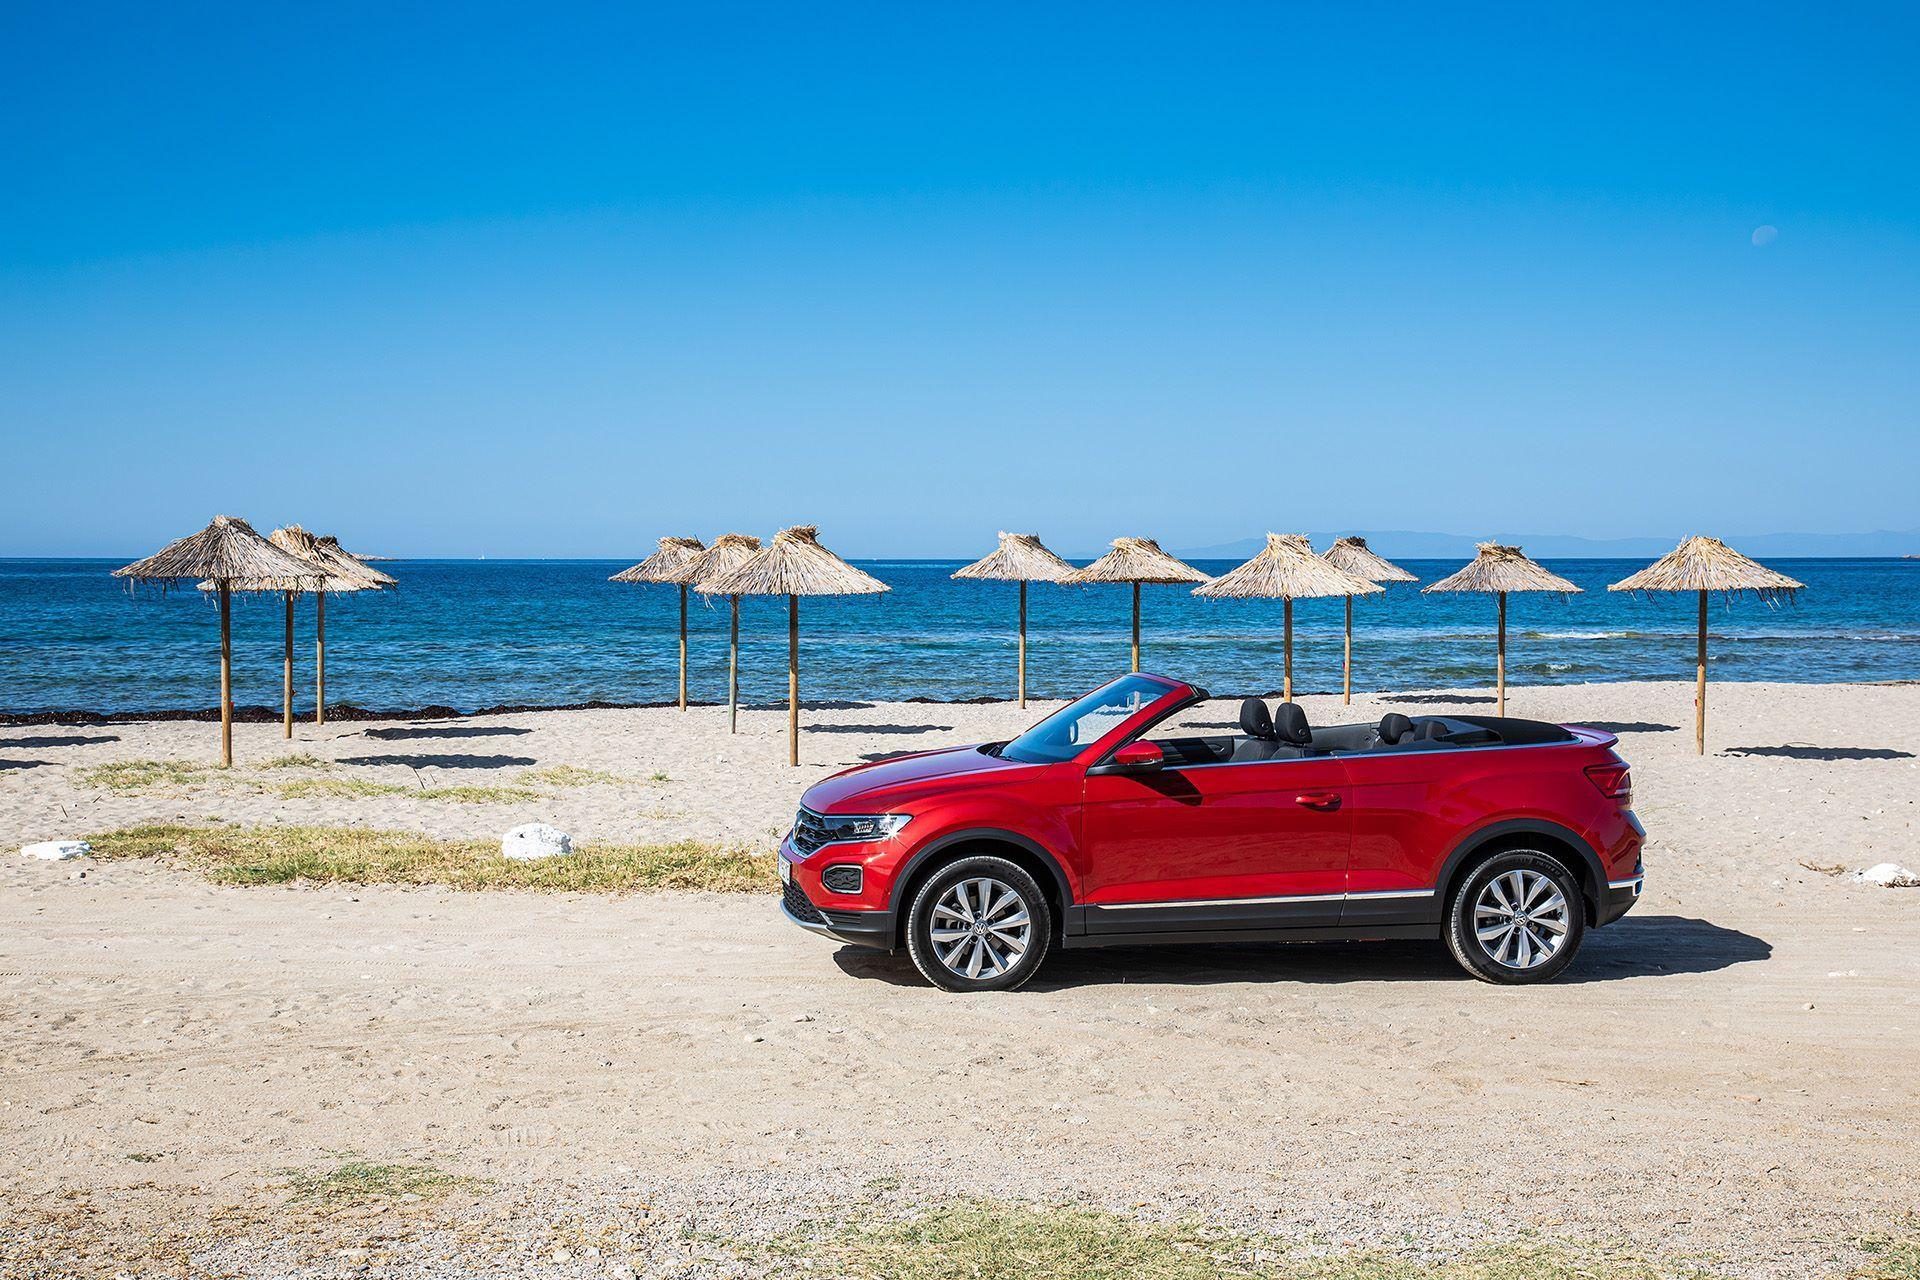 Volkswagen-T-Roc-Cabriolet-Greece-38